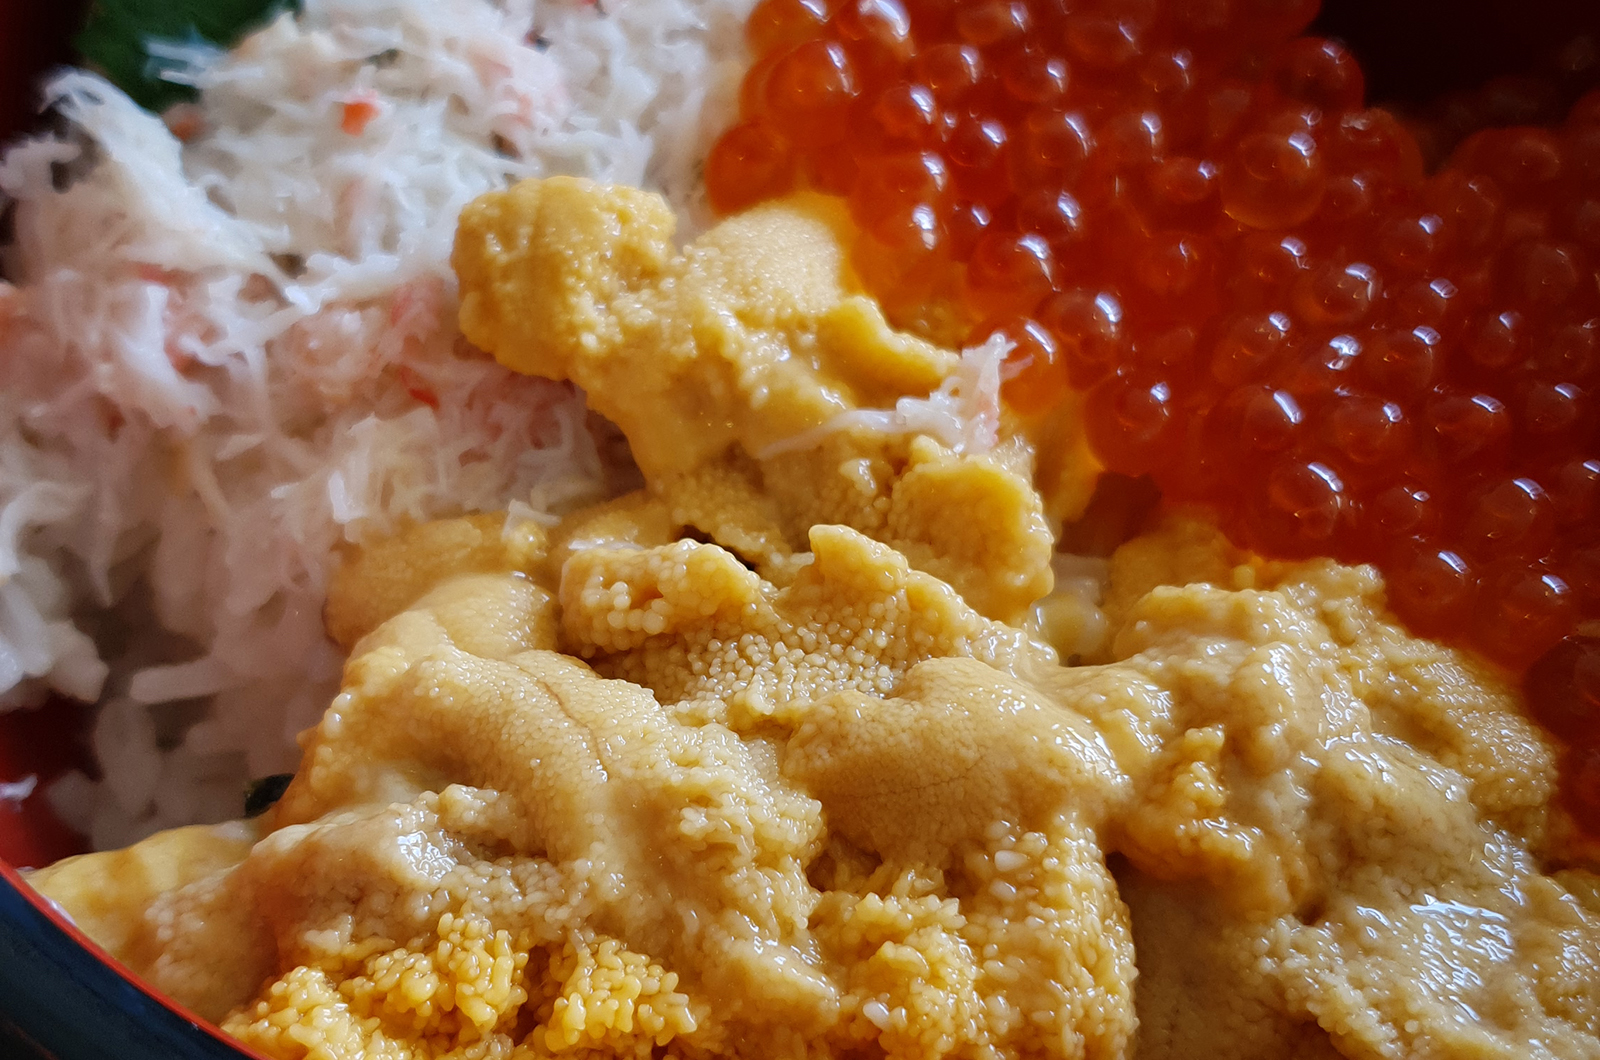 uni sea urchin shakotan hokkaido japan